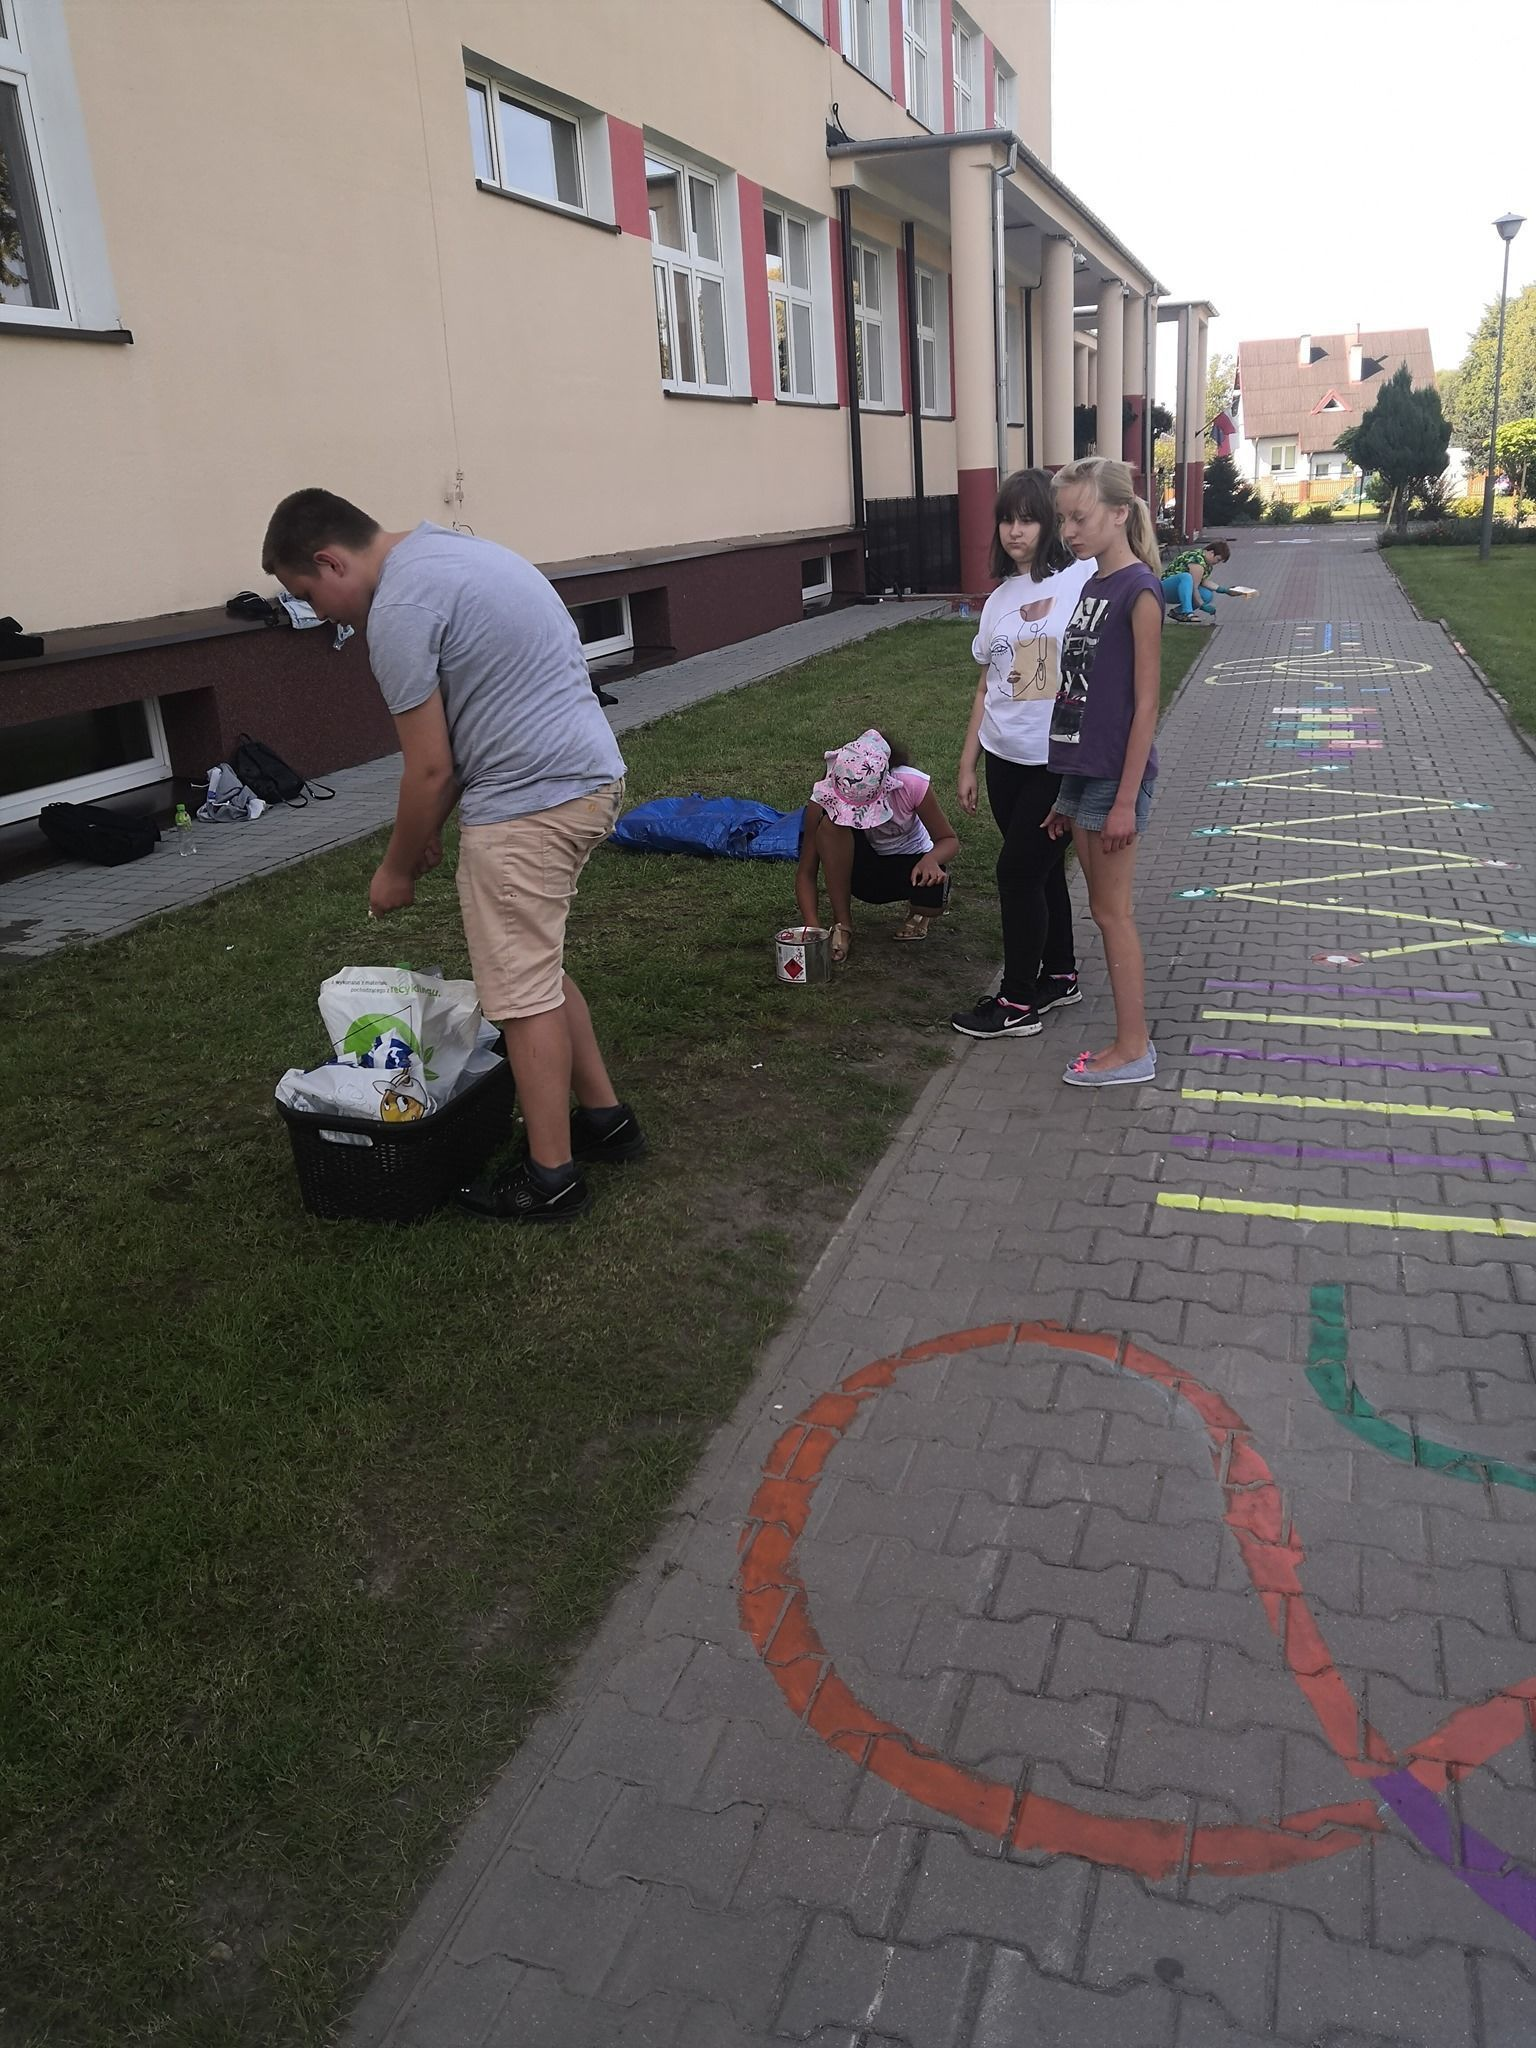 Malunki gier na chodniku